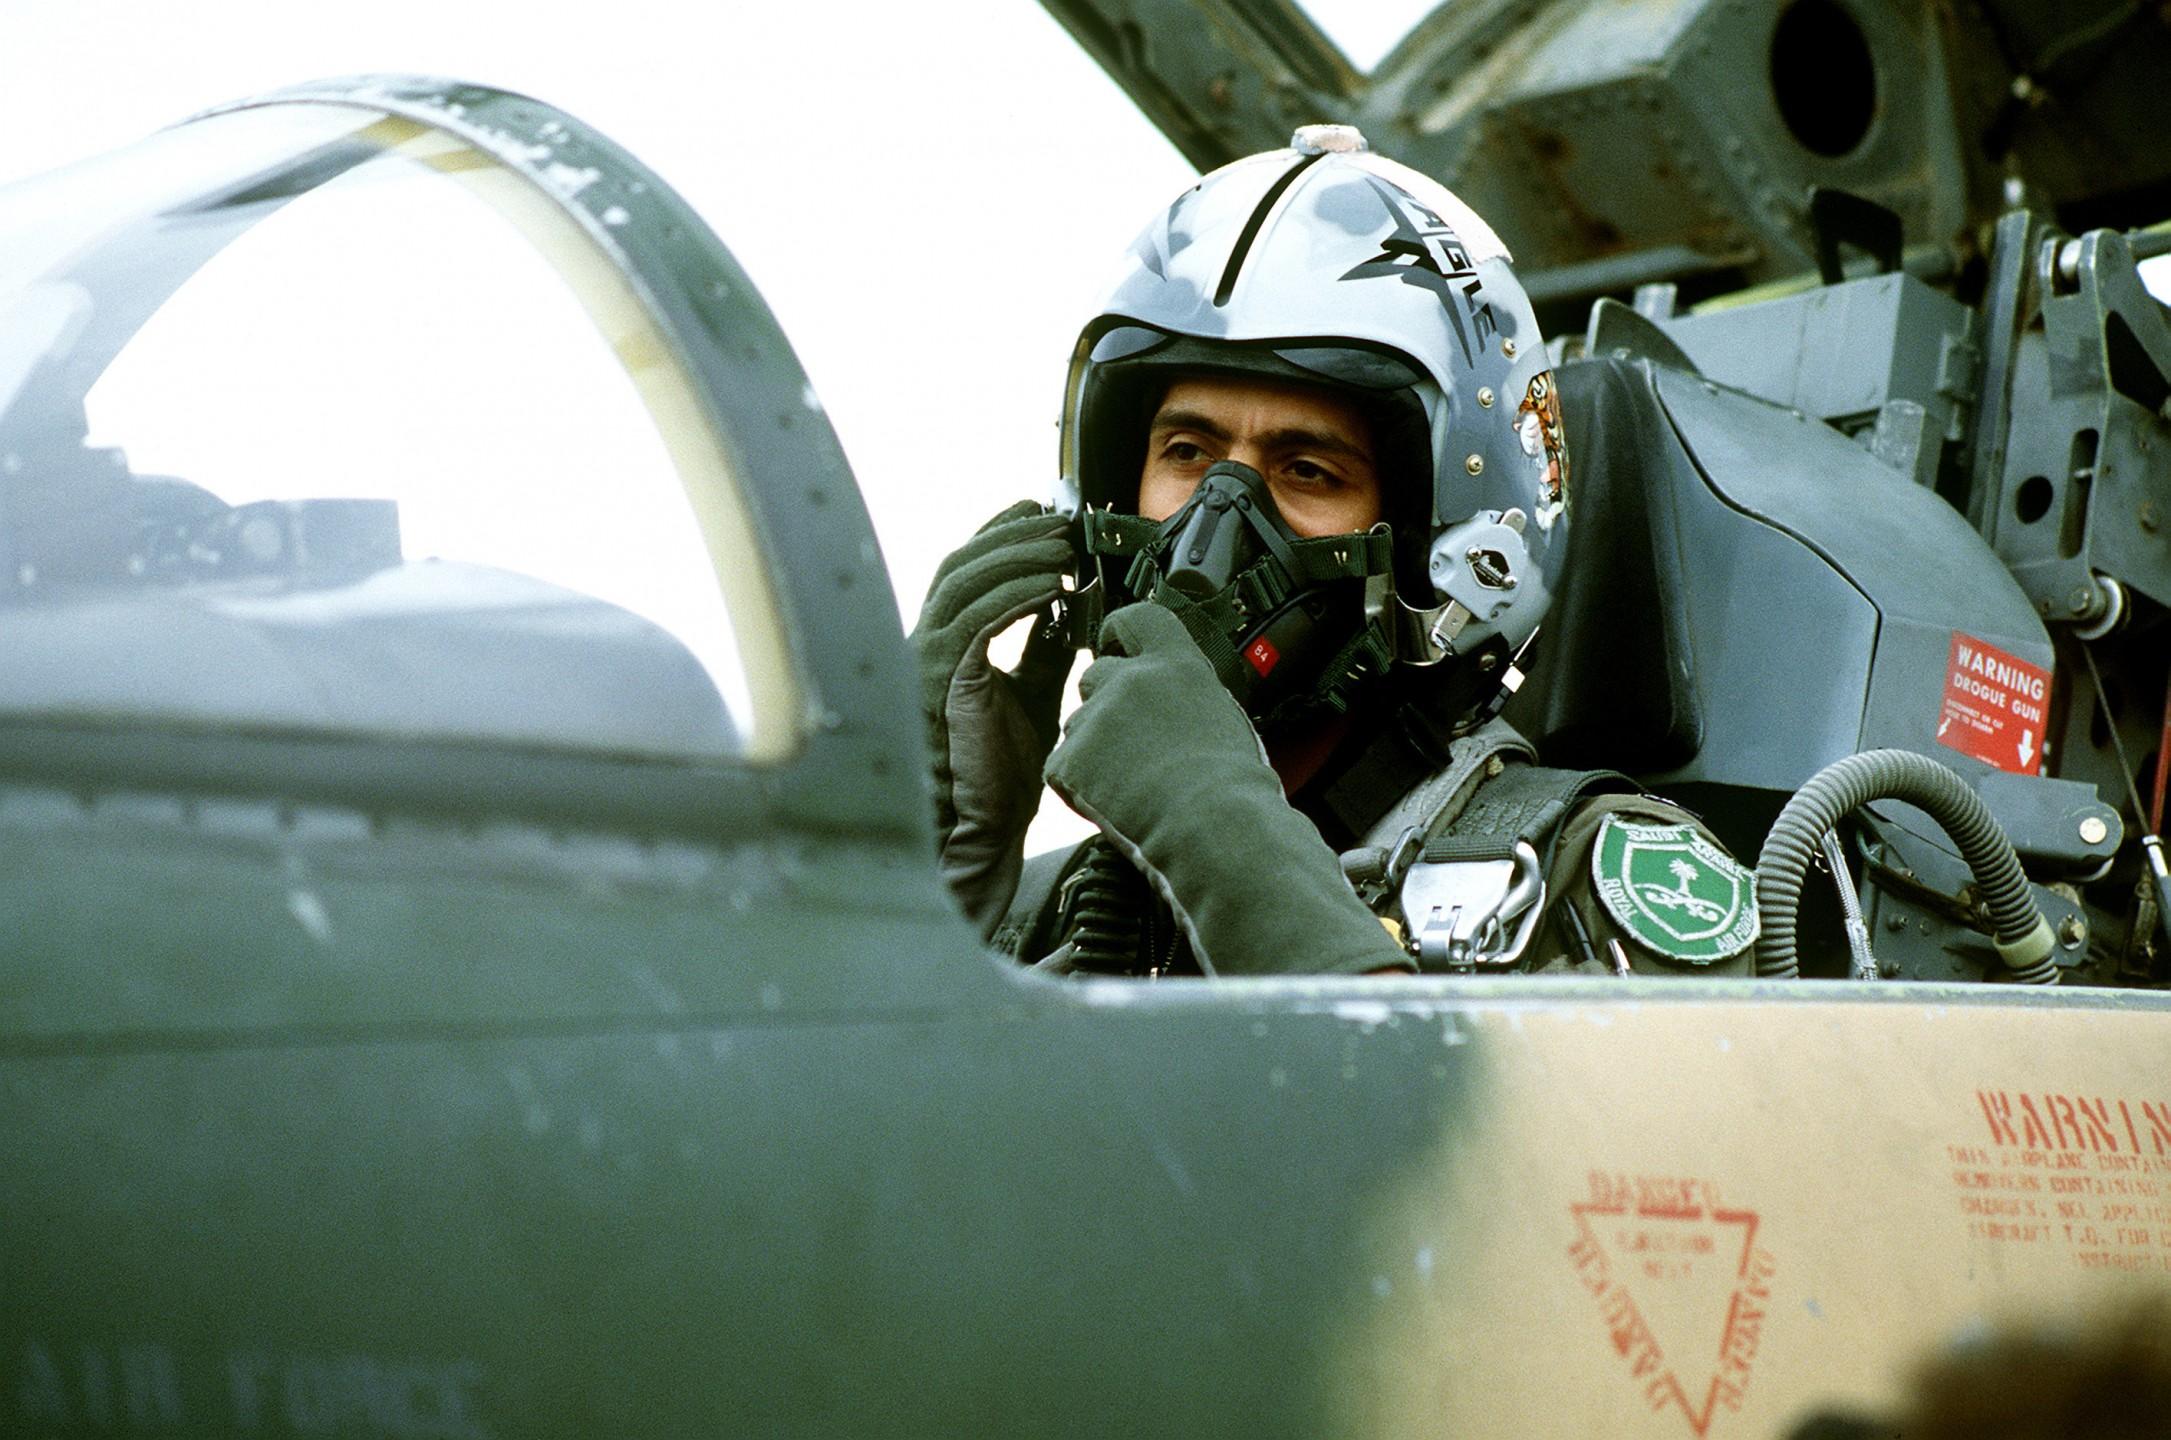 saudi_air_force_al_shahrani.jpeg